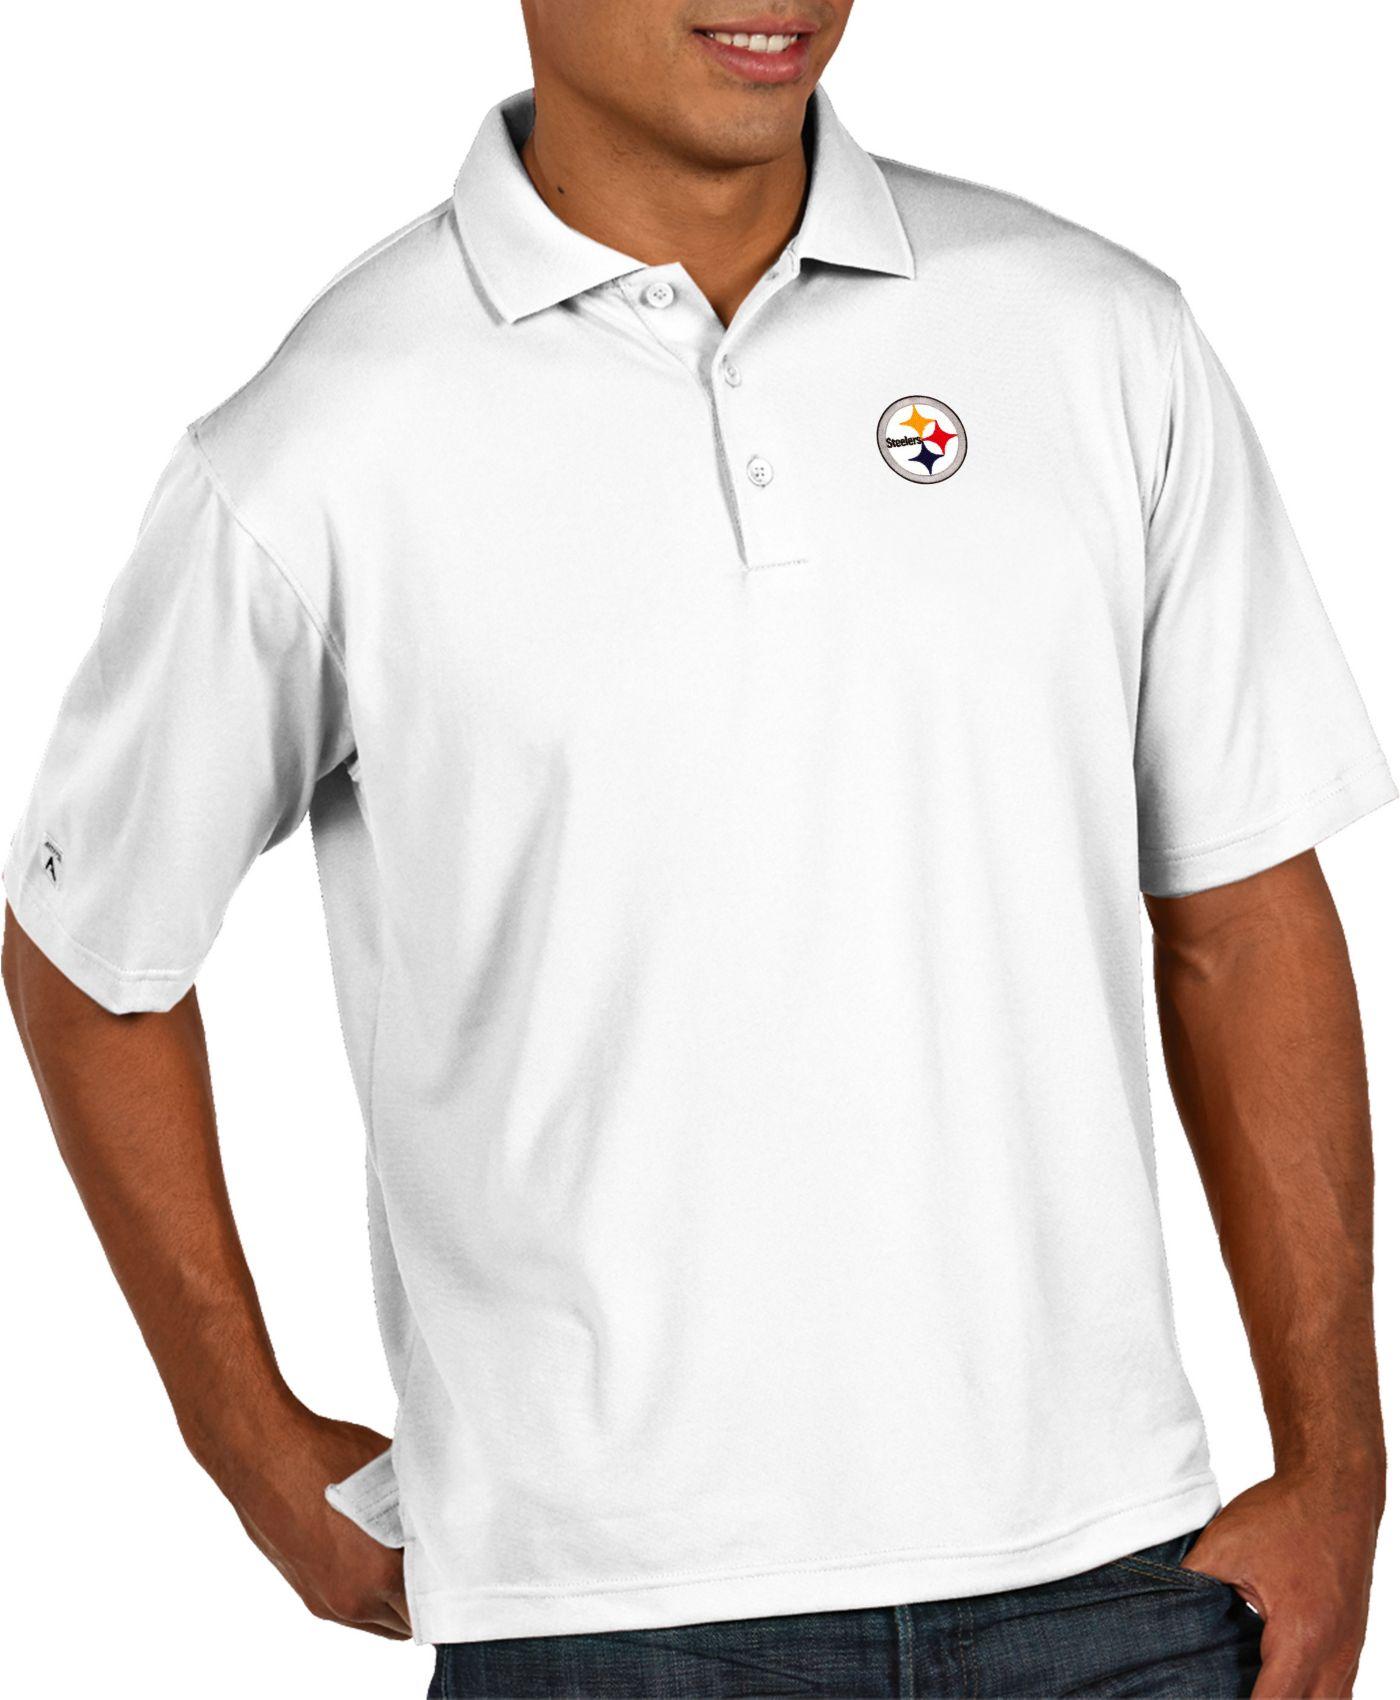 Antigua Men's Pittsburgh Steelers Pique Xtra-Lite Performance White Polo